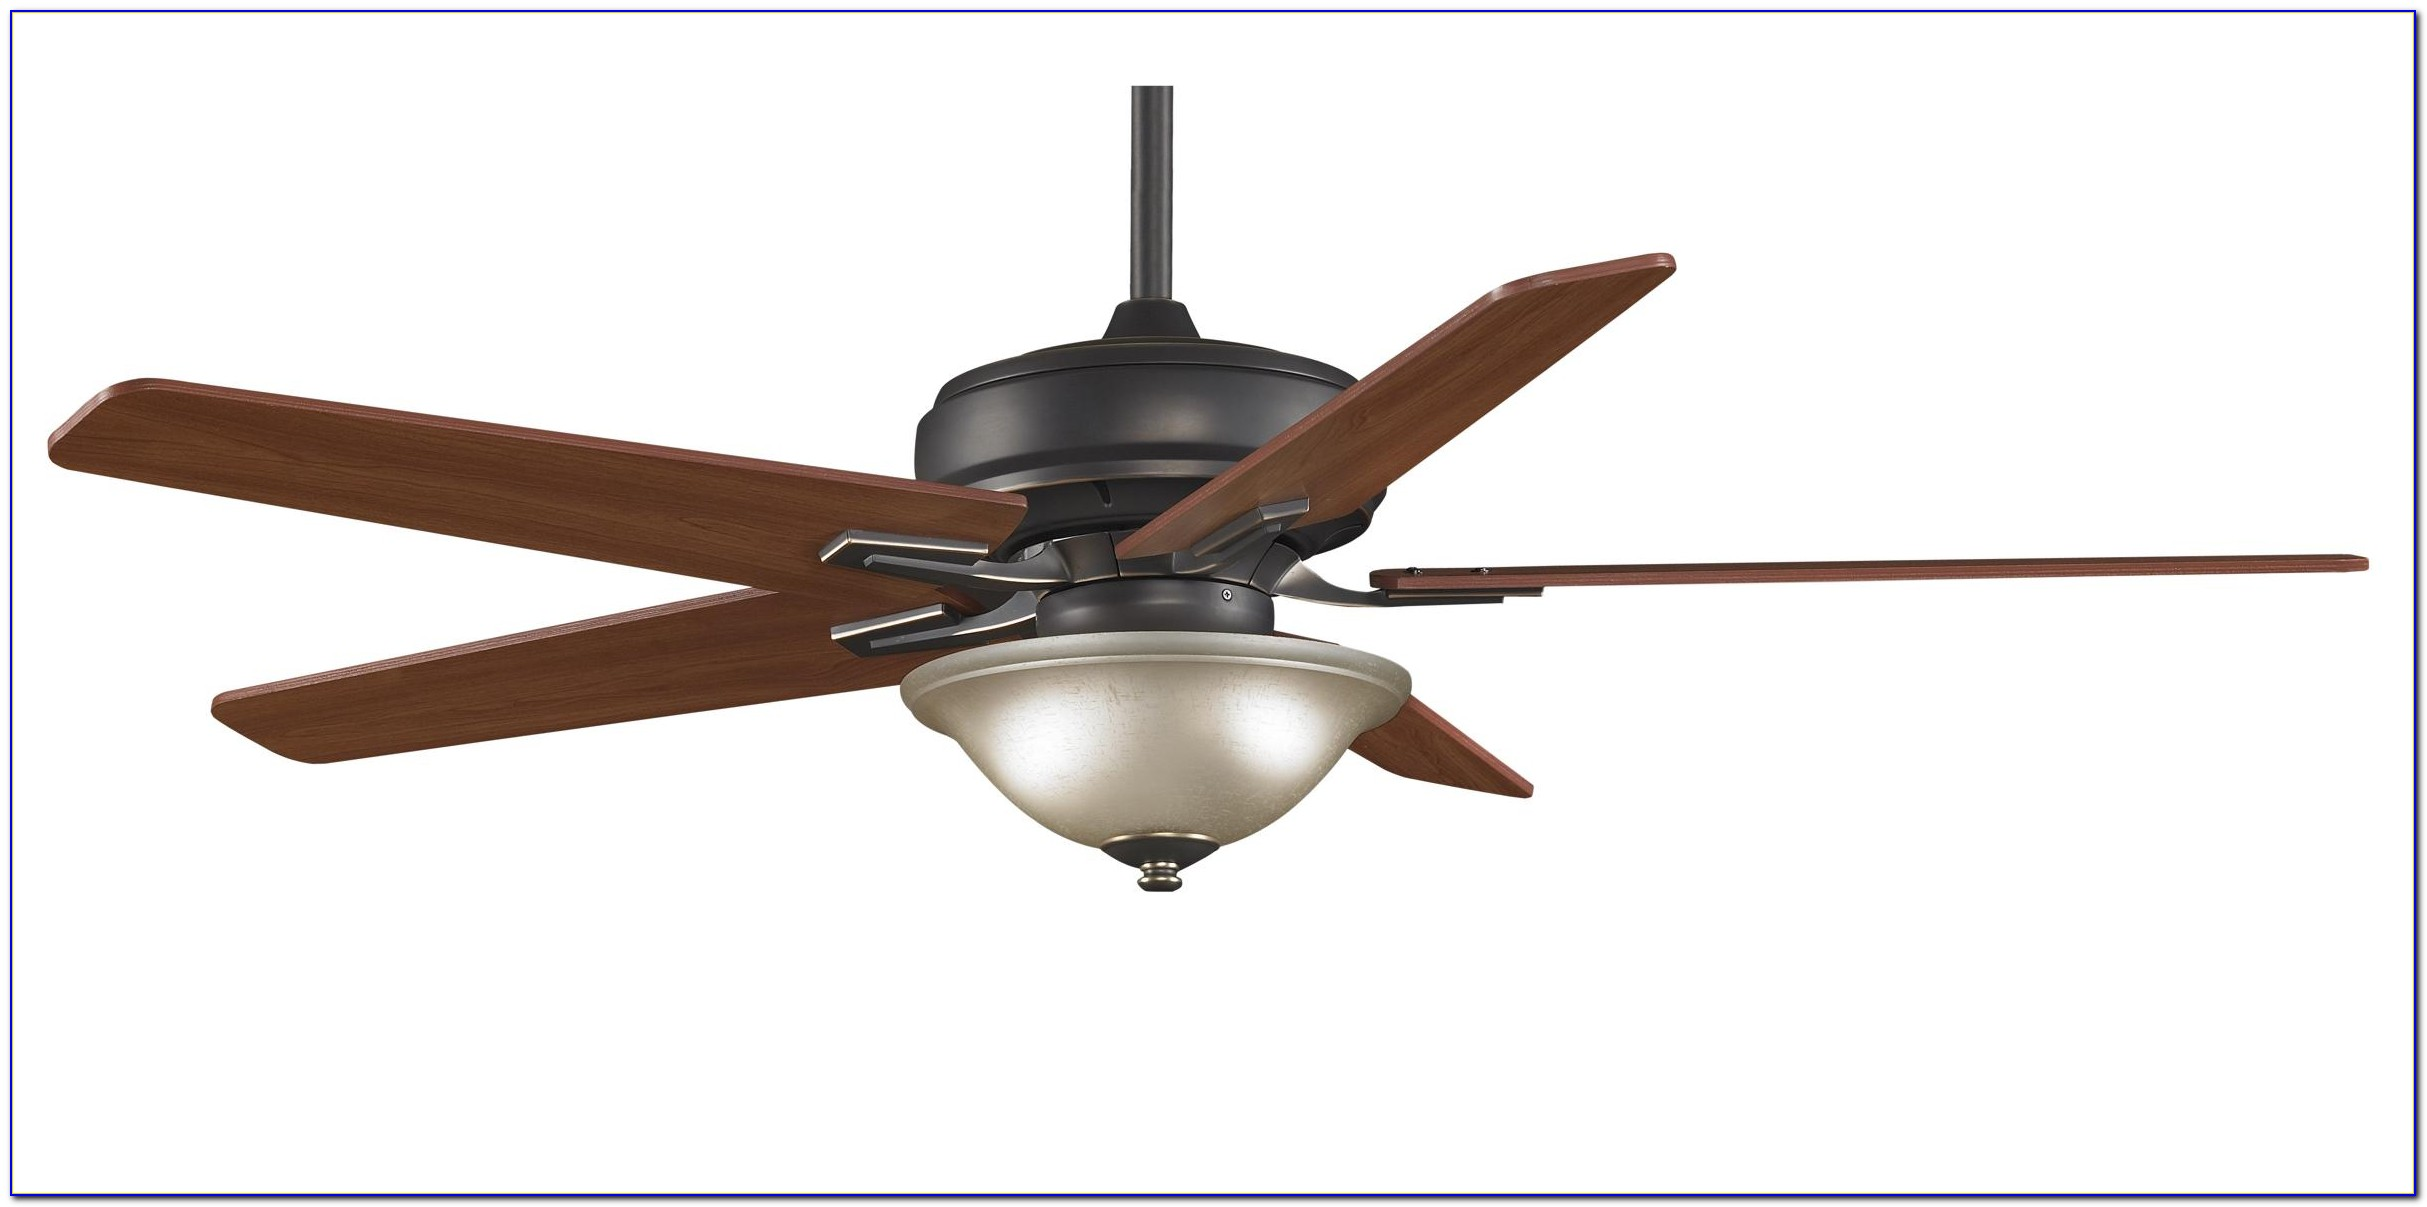 60 Ceiling Fan With Dc Motor